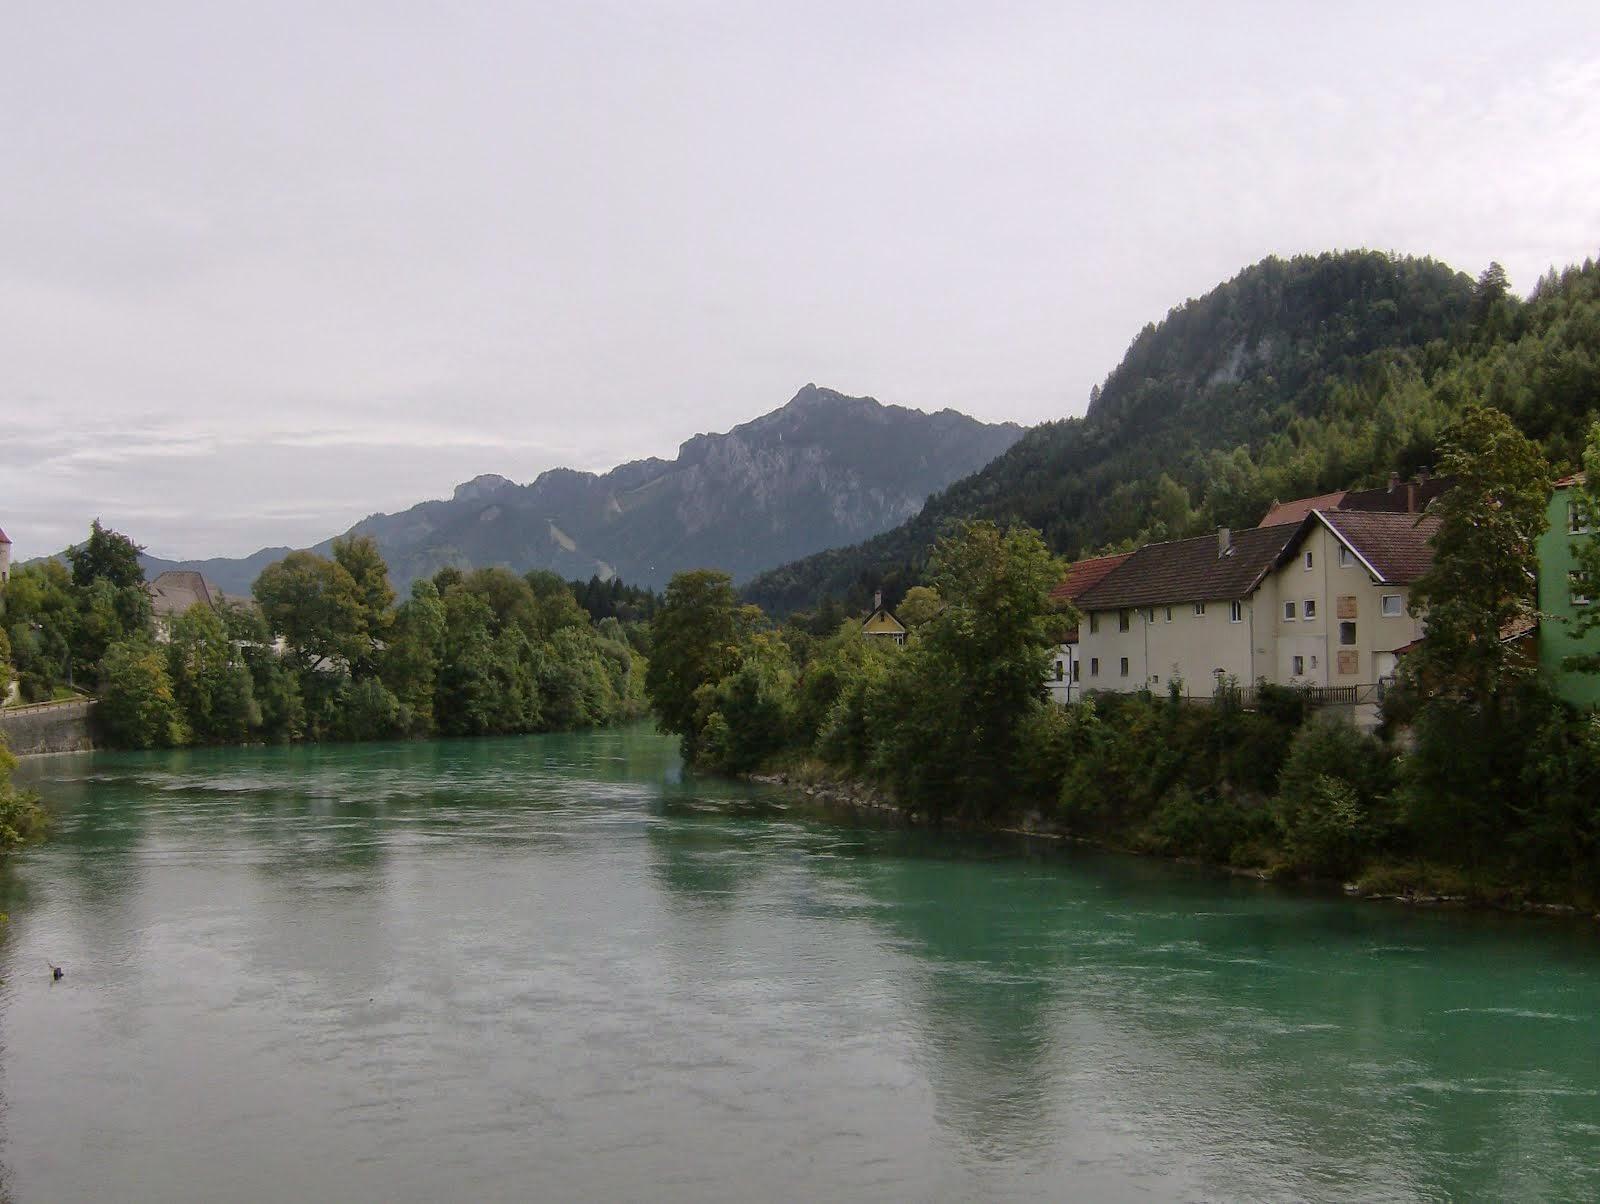 Orilla del Tirol, río Lech